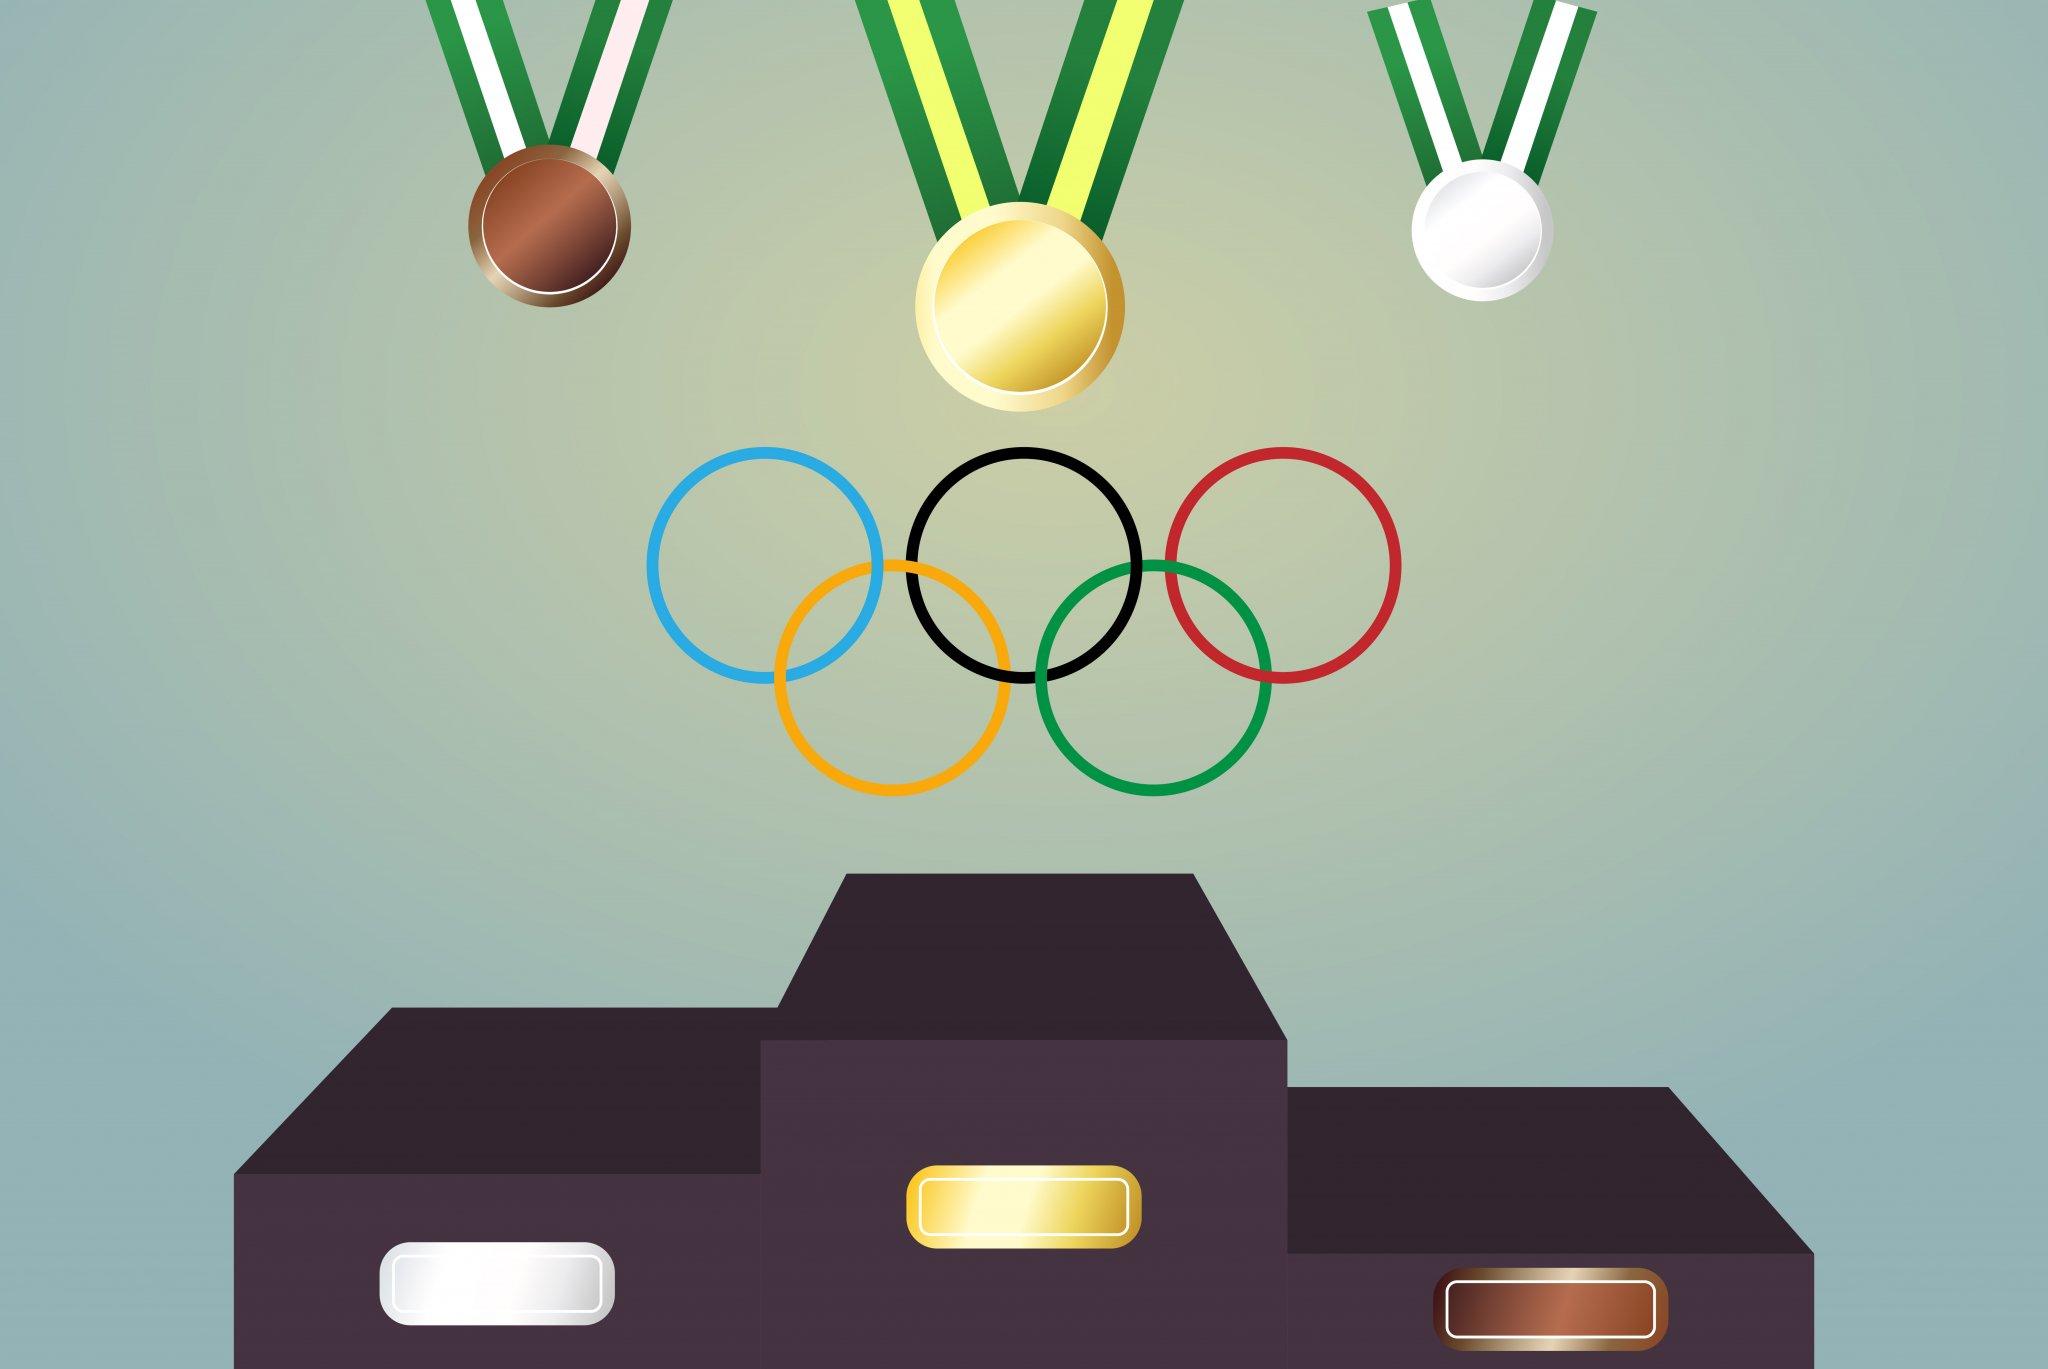 OLYMPIC_cartoon character in podium